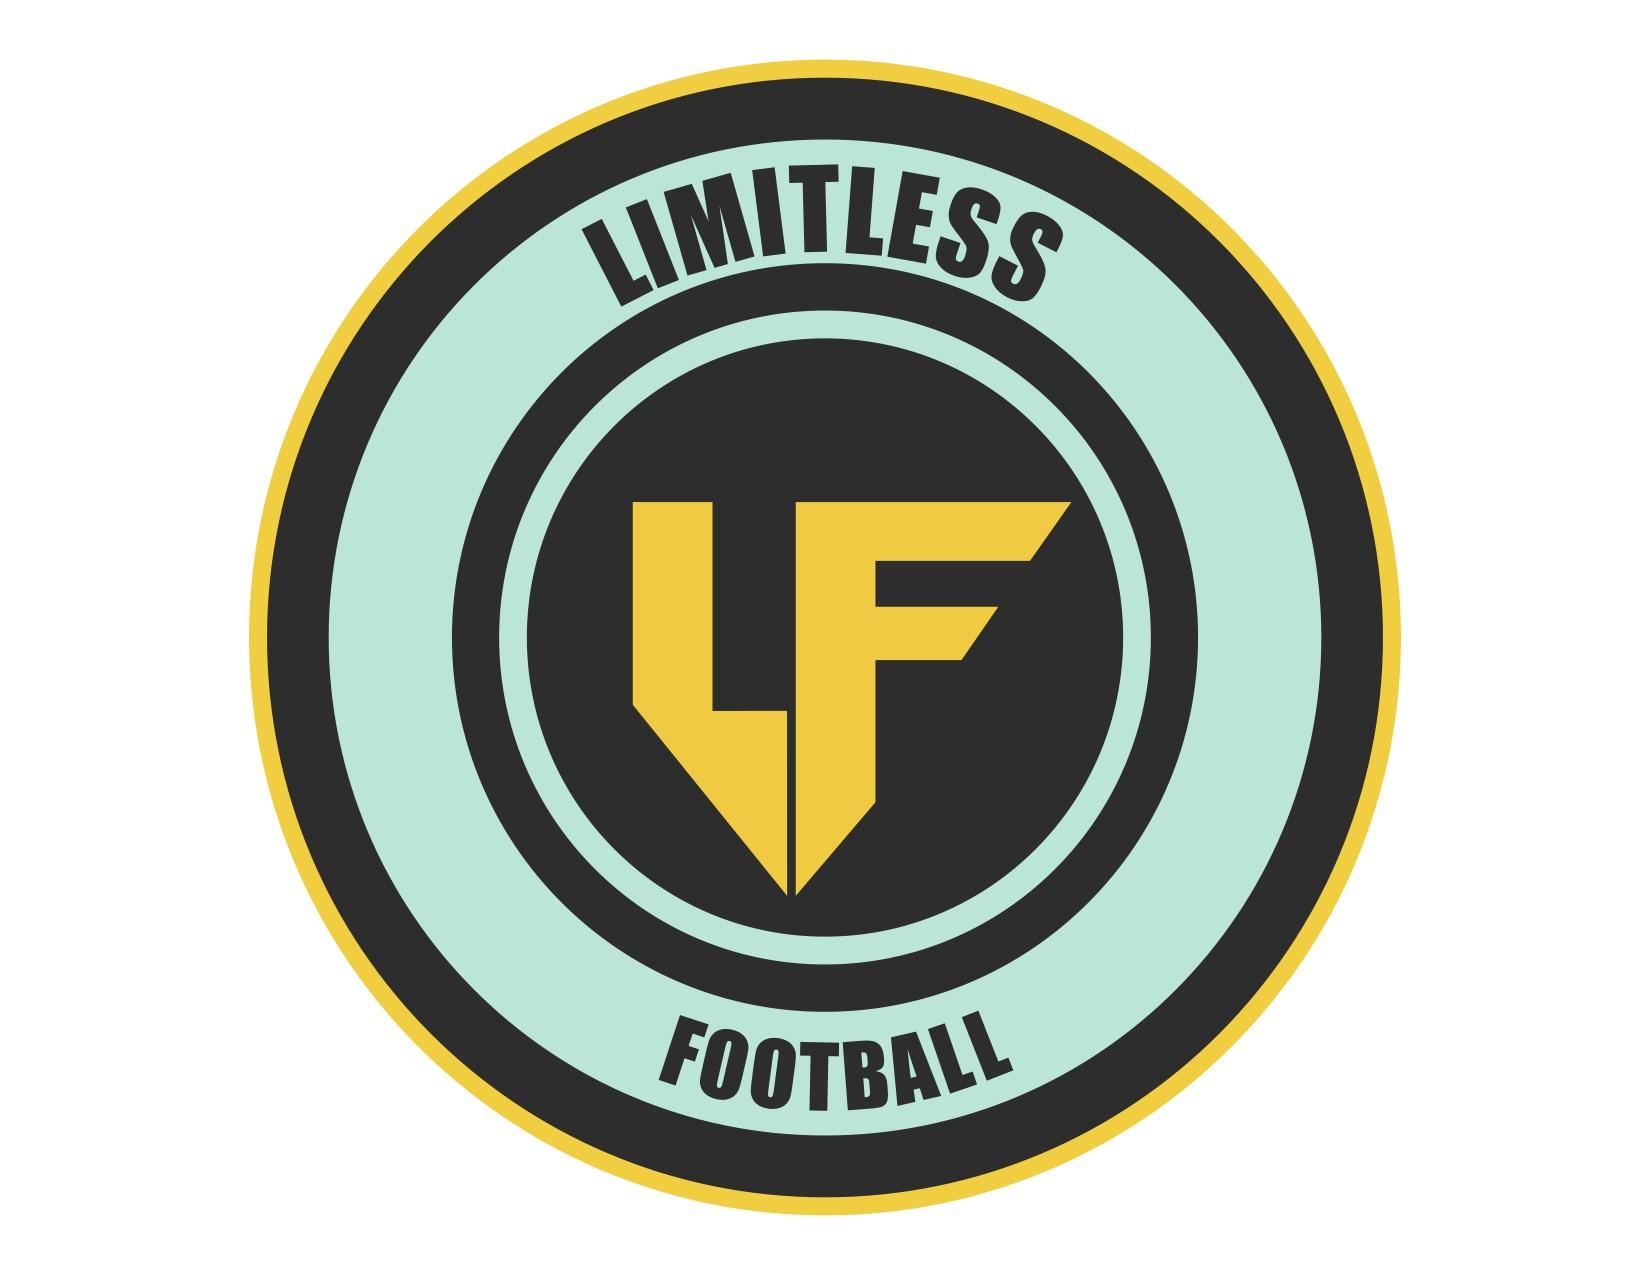 Limitless Football Registration Form